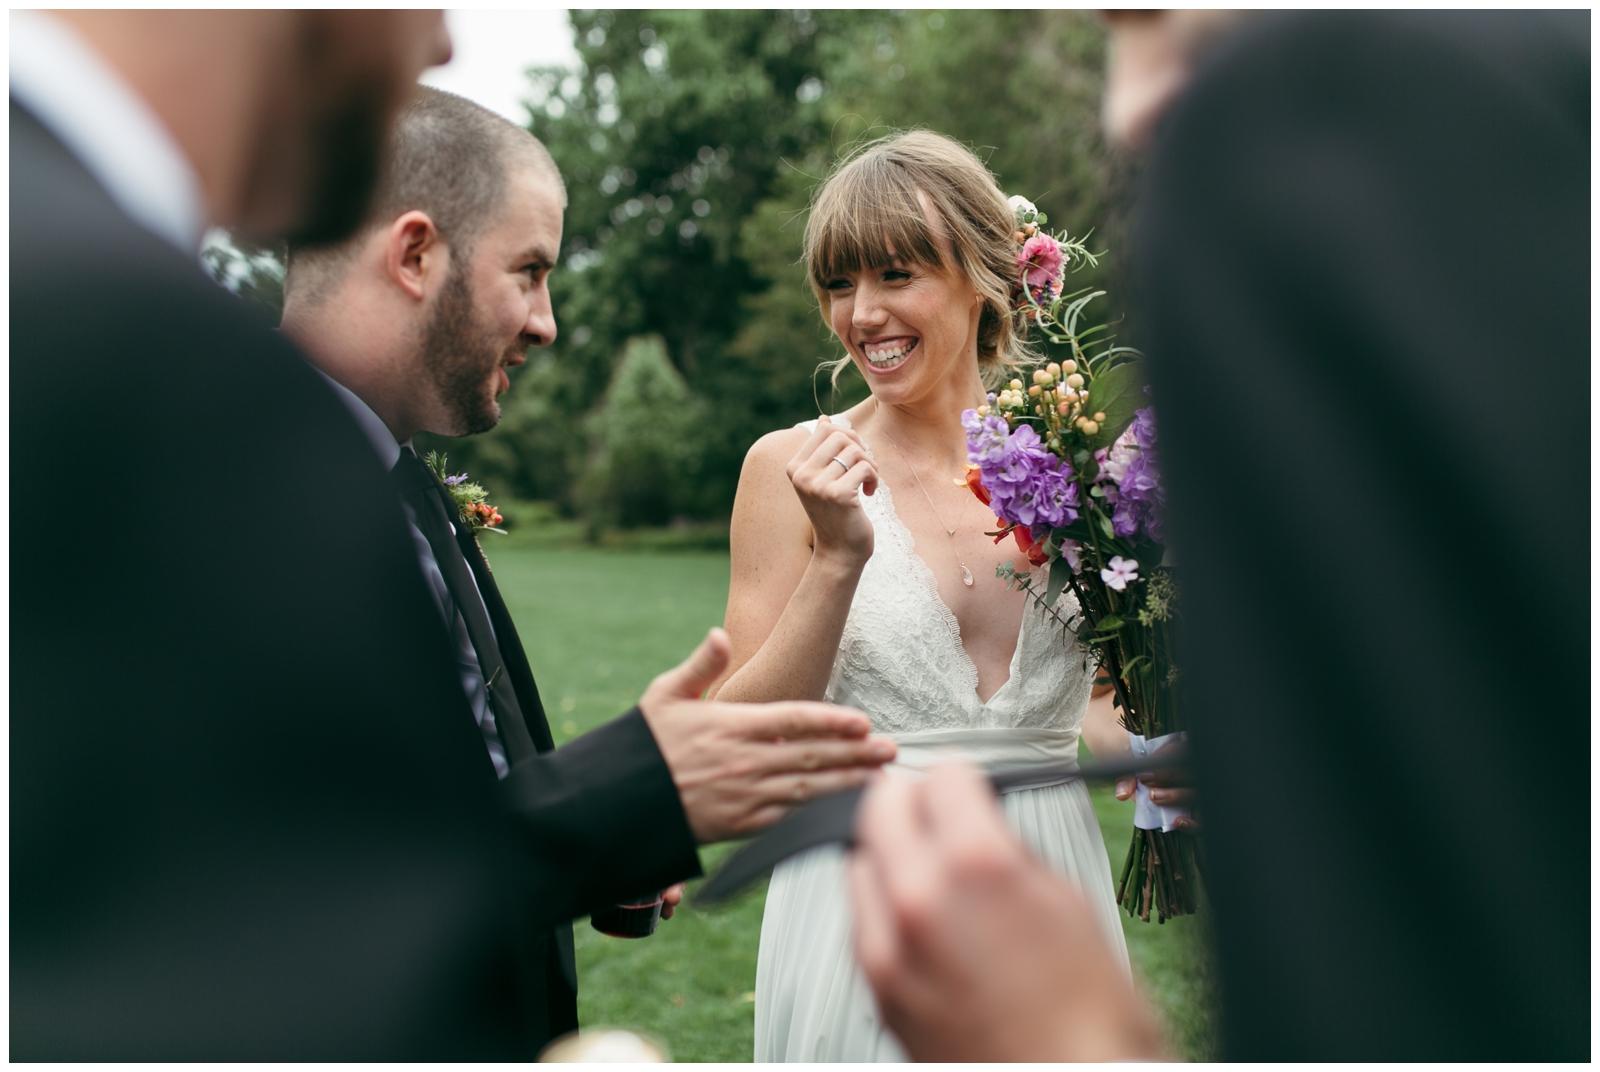 Moraine-Farm-wedding-Bailey-Q-Photo-Massachusetts-wedding-photpgrapher-079.jpg